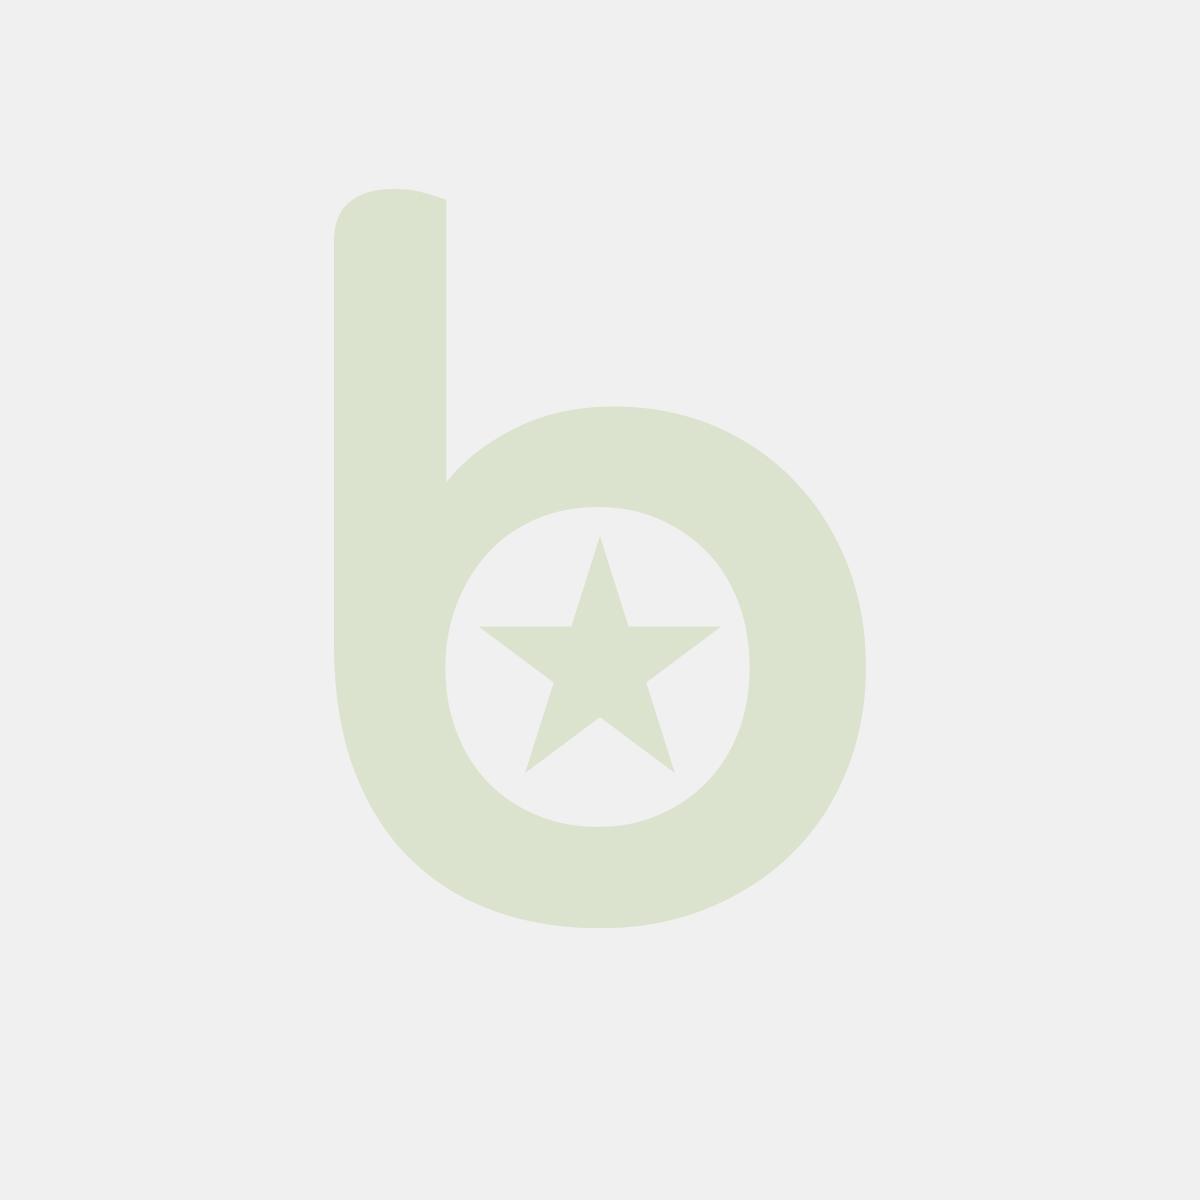 FINGERFOOD - kubek BAMBOO 60ml PS-BIO, transparentny fi.4,3x h.8cm op. 25 sztuk